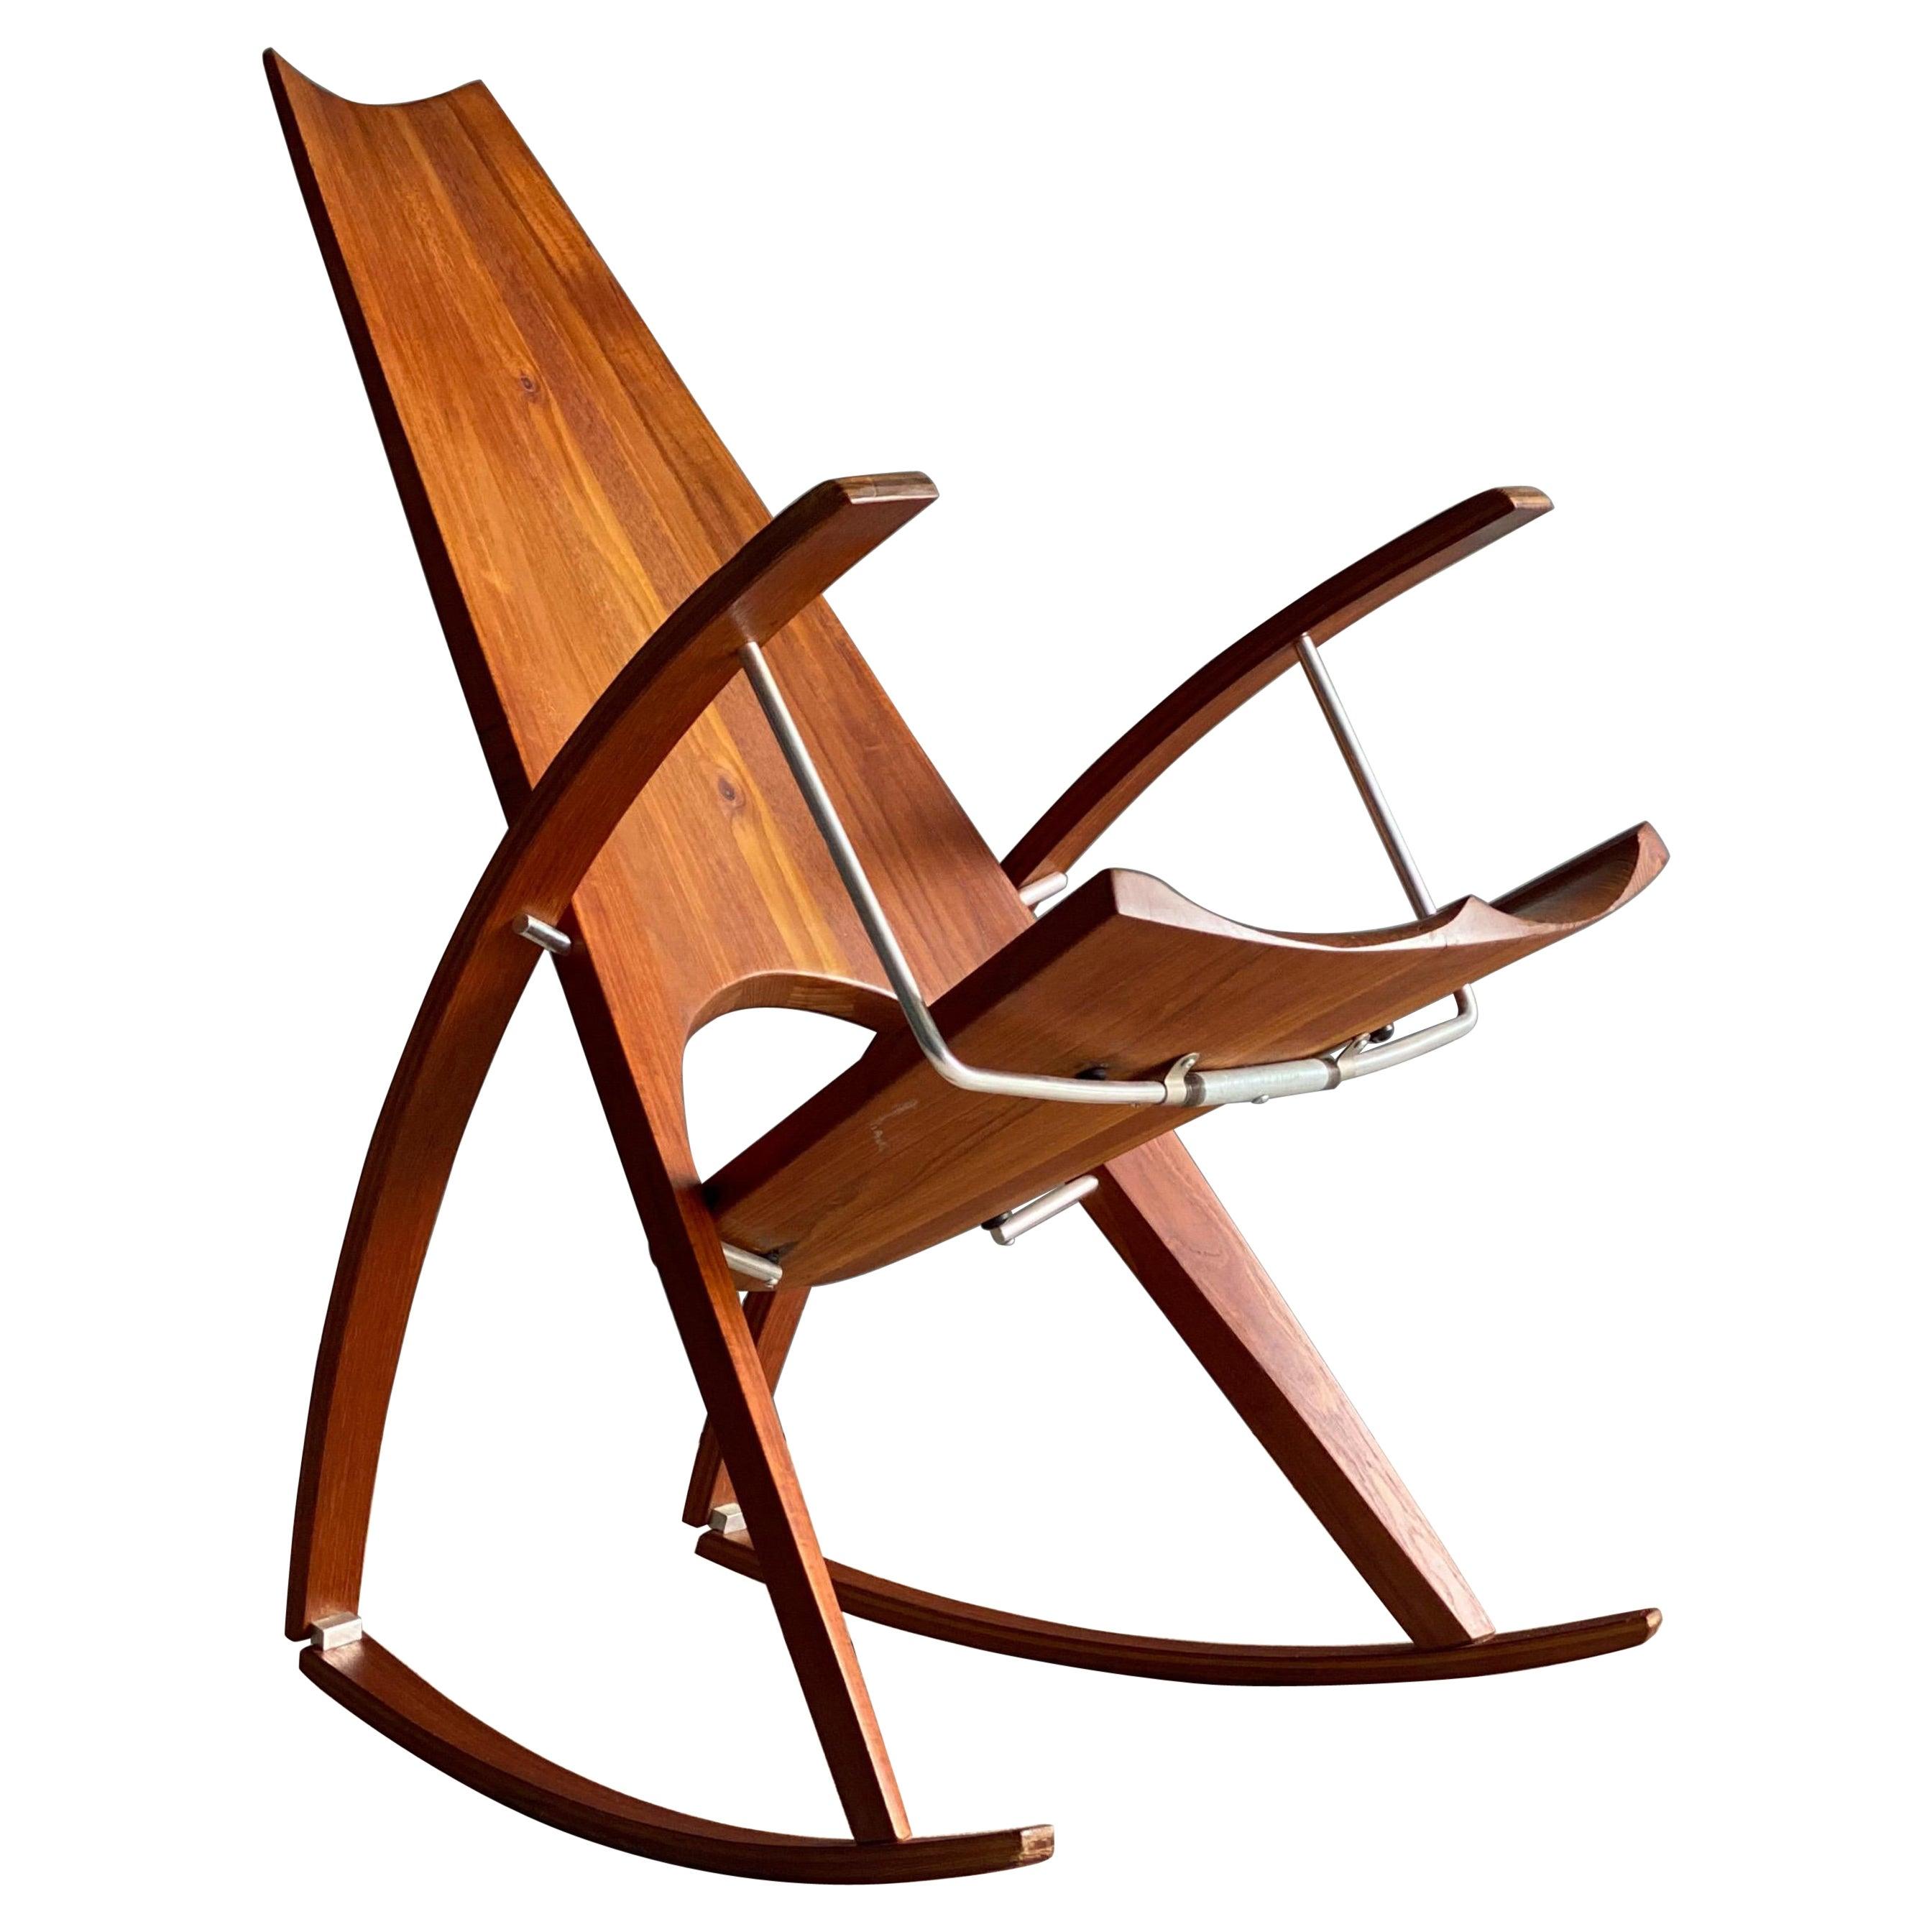 Studio Rocking Chair by Leon Meyer